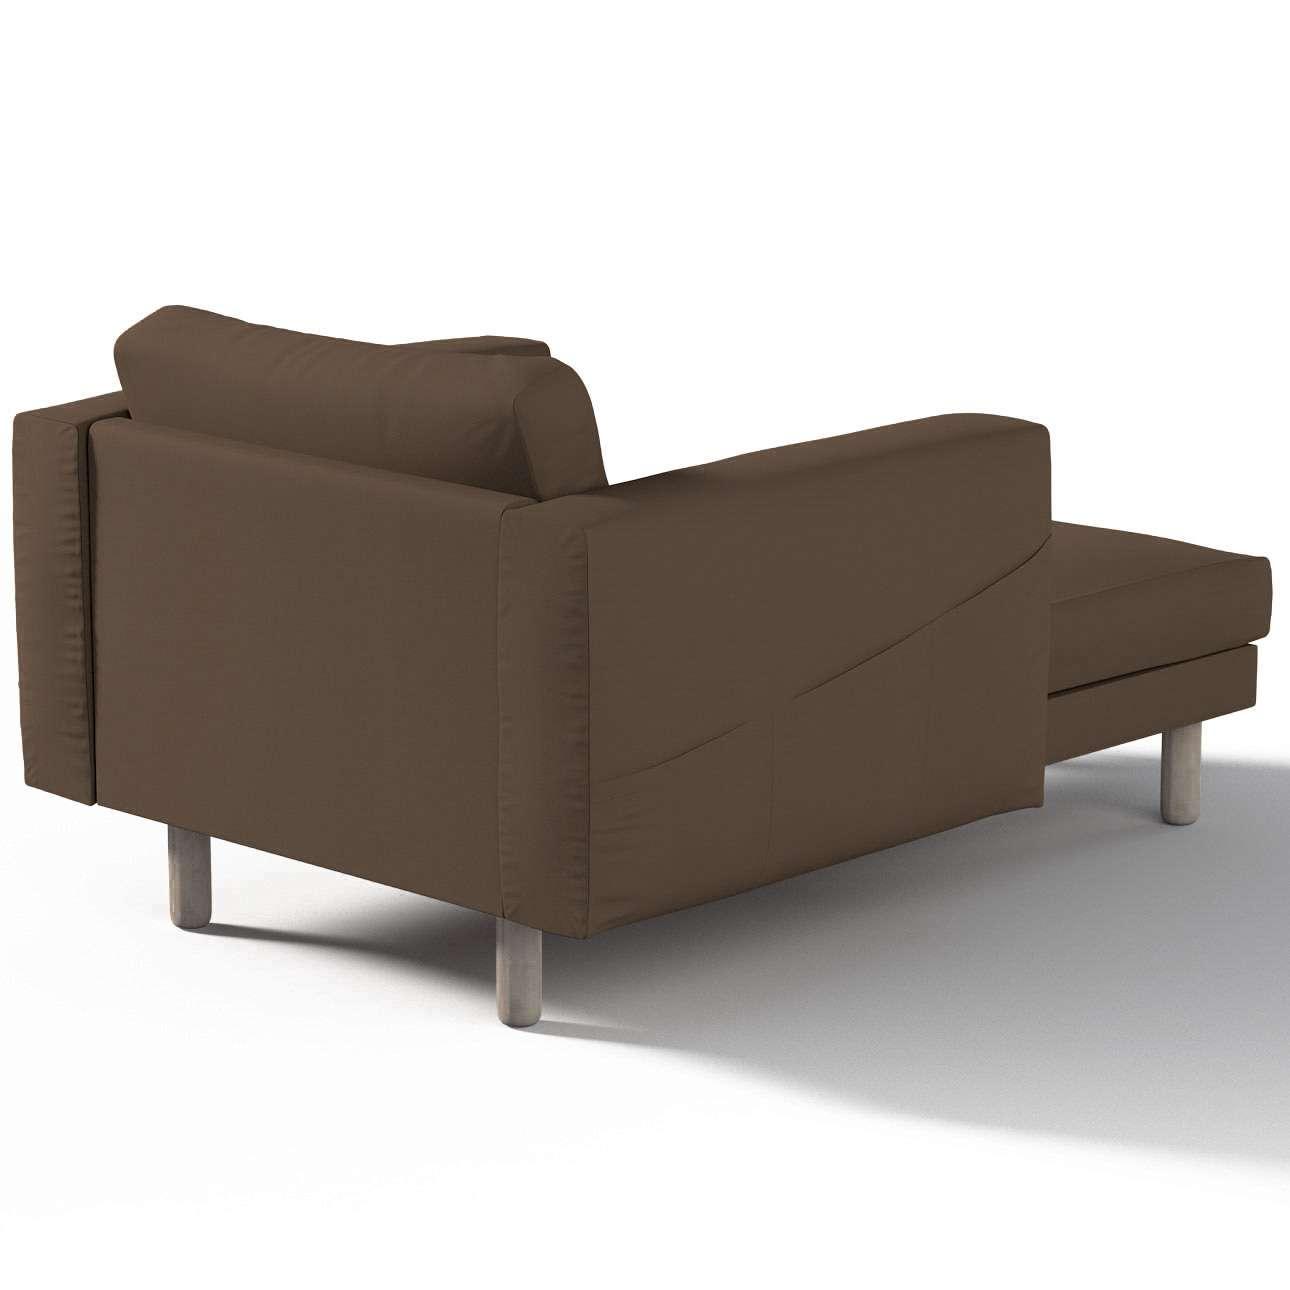 Poťah na sedačku Norsborg s podrúčkami V kolekcii Cotton Panama, tkanina: 702-02